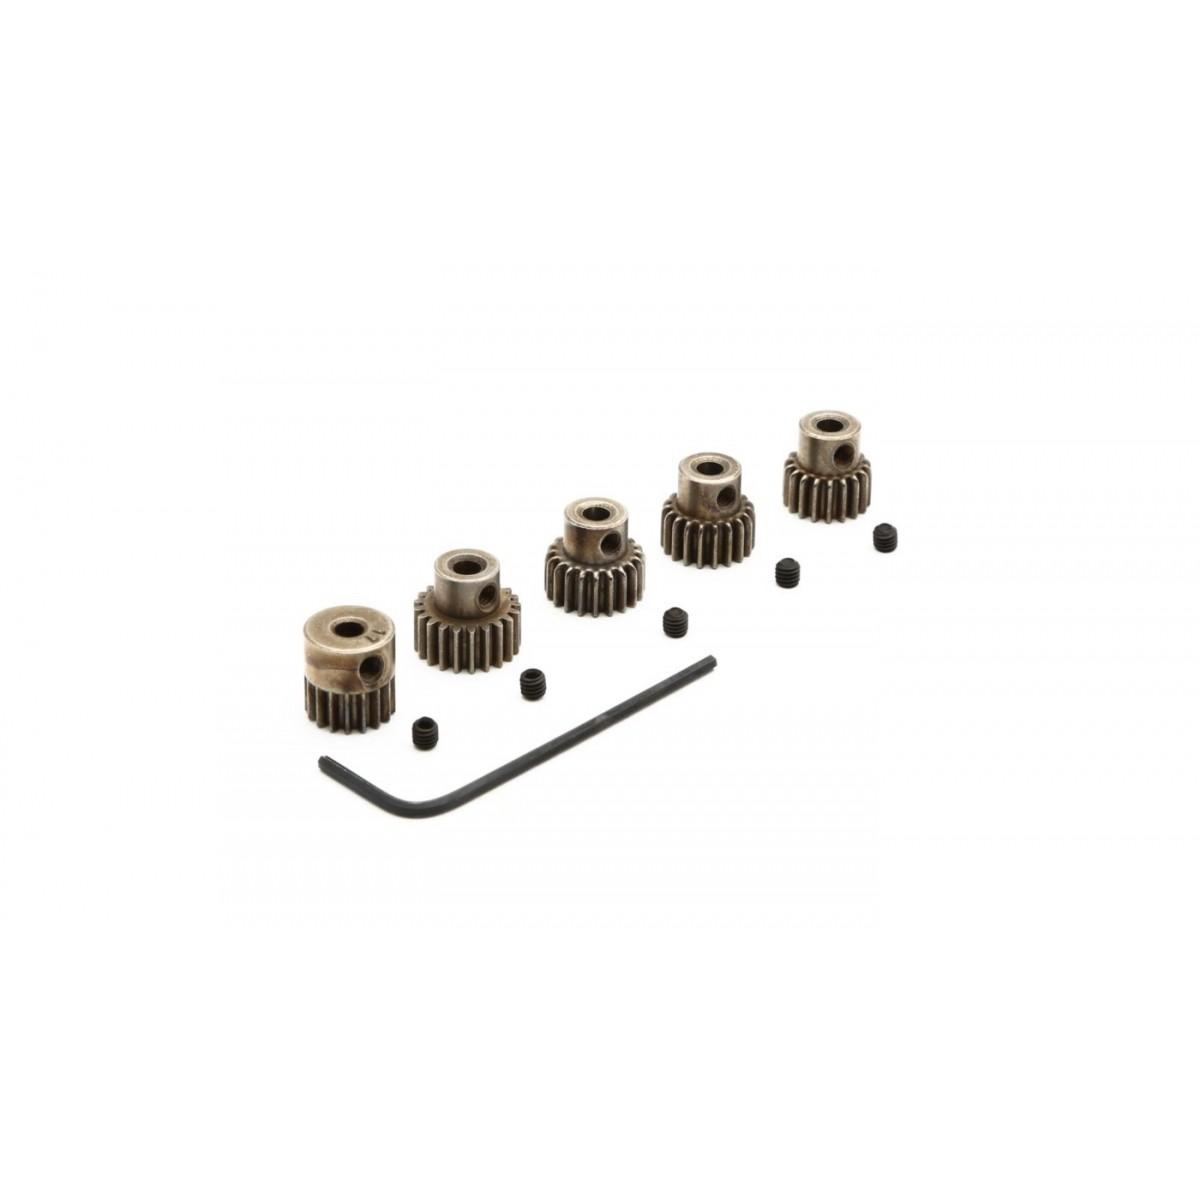 DYNG4810 - 48P Pinion Gear Set: 17T, 18T, 19T, 20T, 21T (3.17mm)